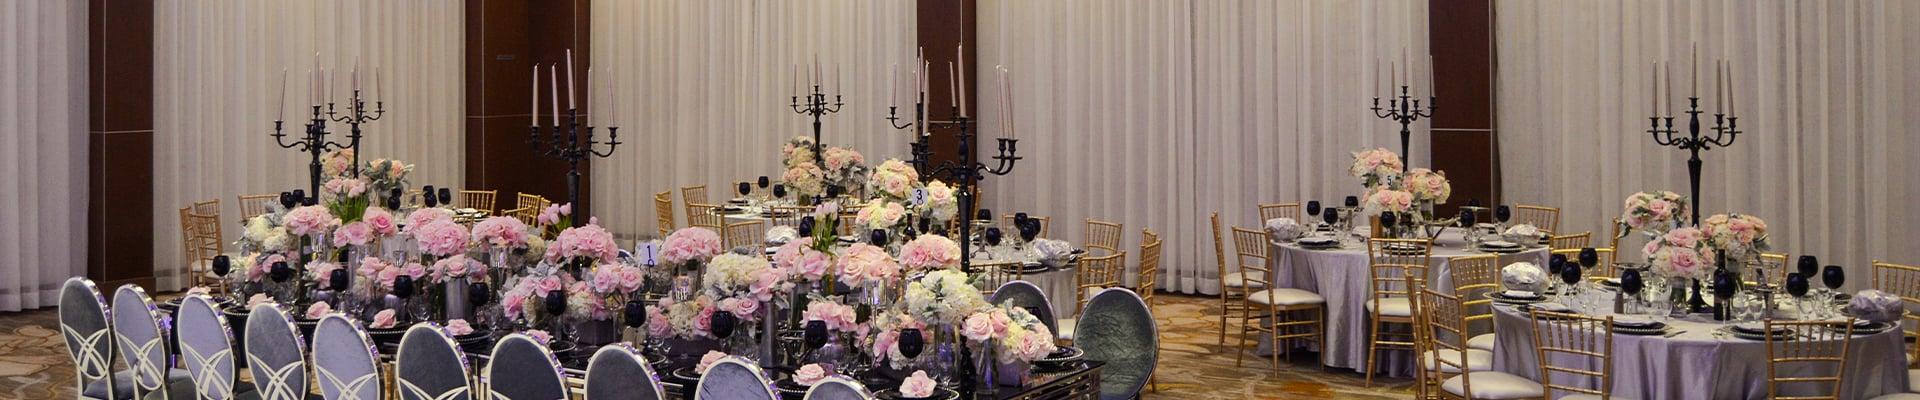 Metropol Banquet Hall - Corporate Venue